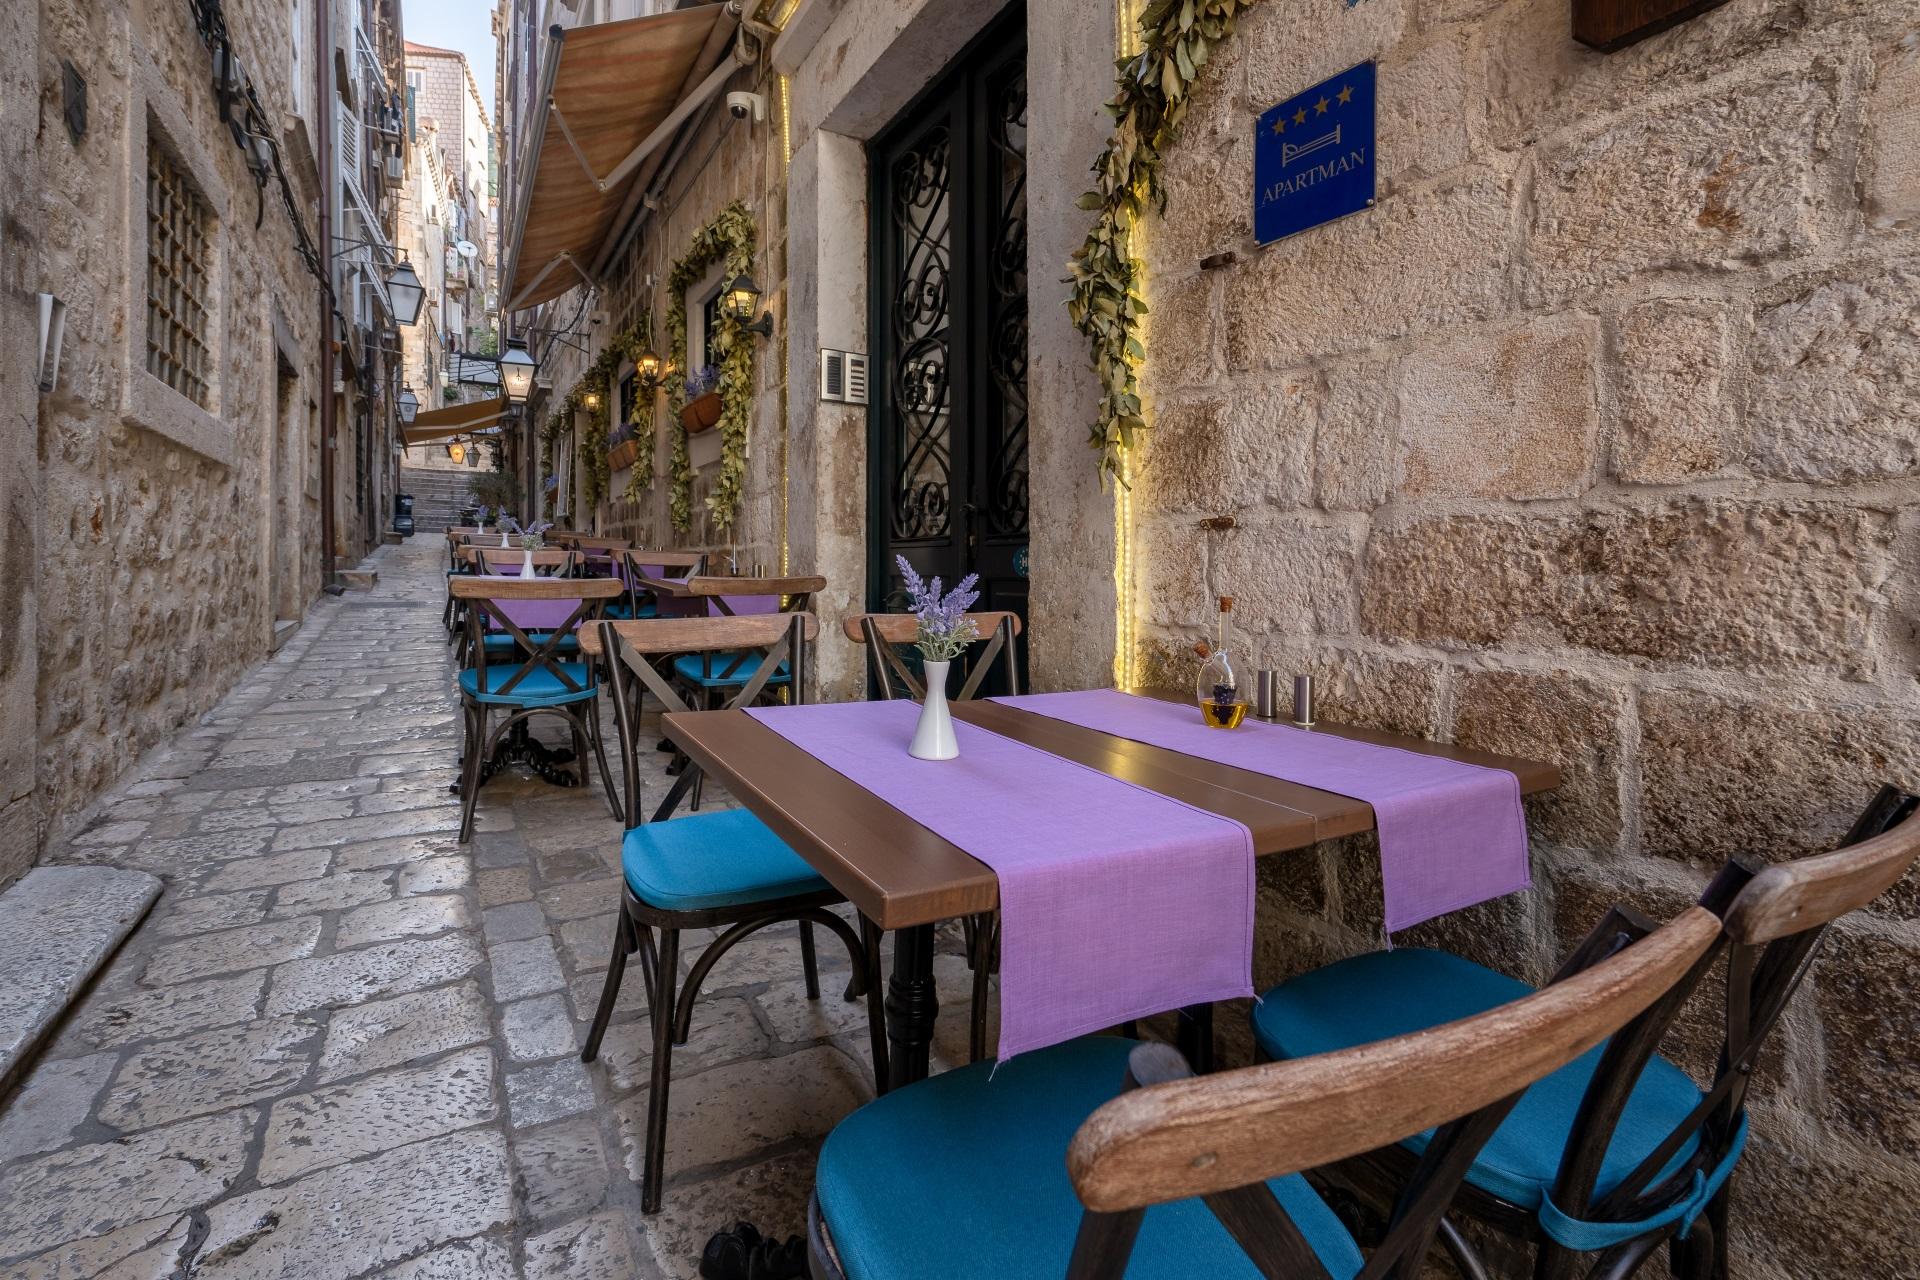 portun tables outside